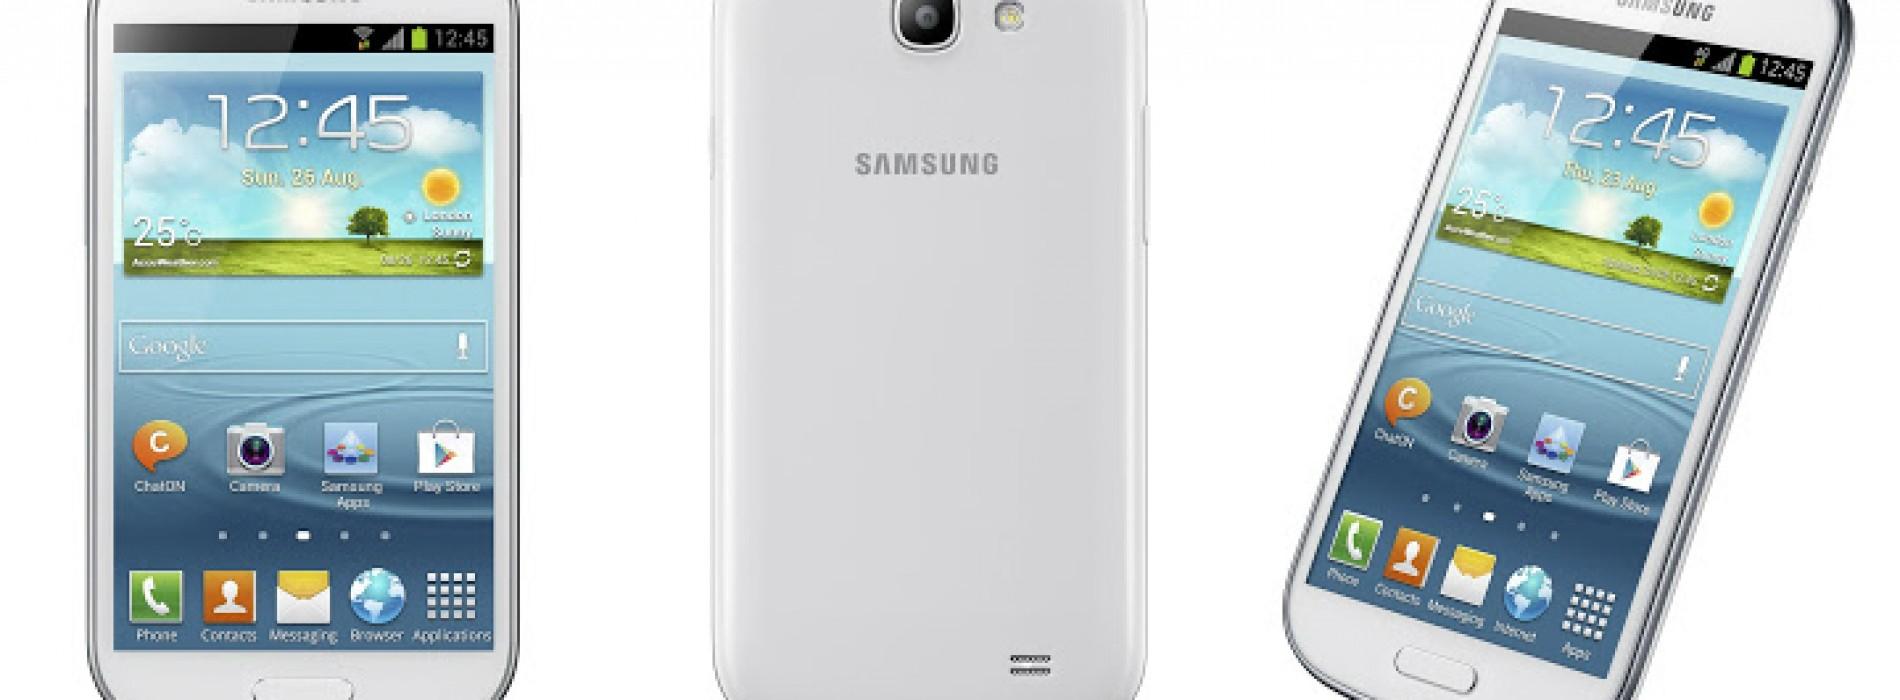 Samsung Galaxy Express announced for international markets